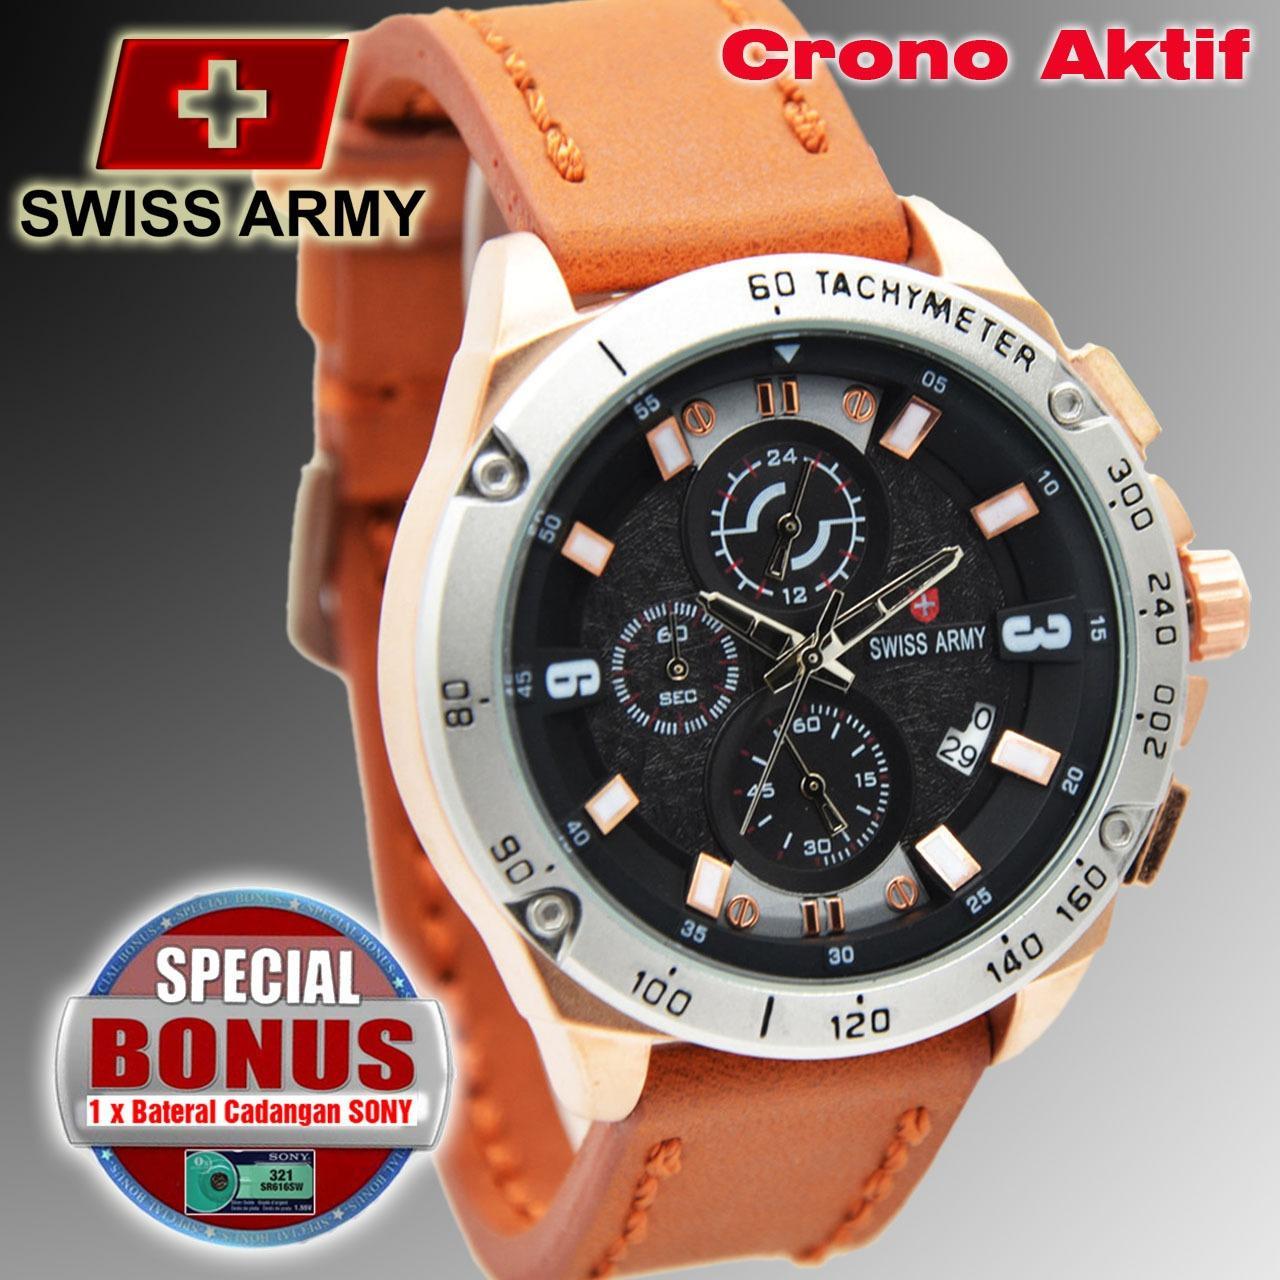 Jam Tangan Swiss Army Harga Terbaik Elegant Day Date Sa 1128 Bl Gry Pria Kulit Hitam 154 Fashion Crono Aktif Strap